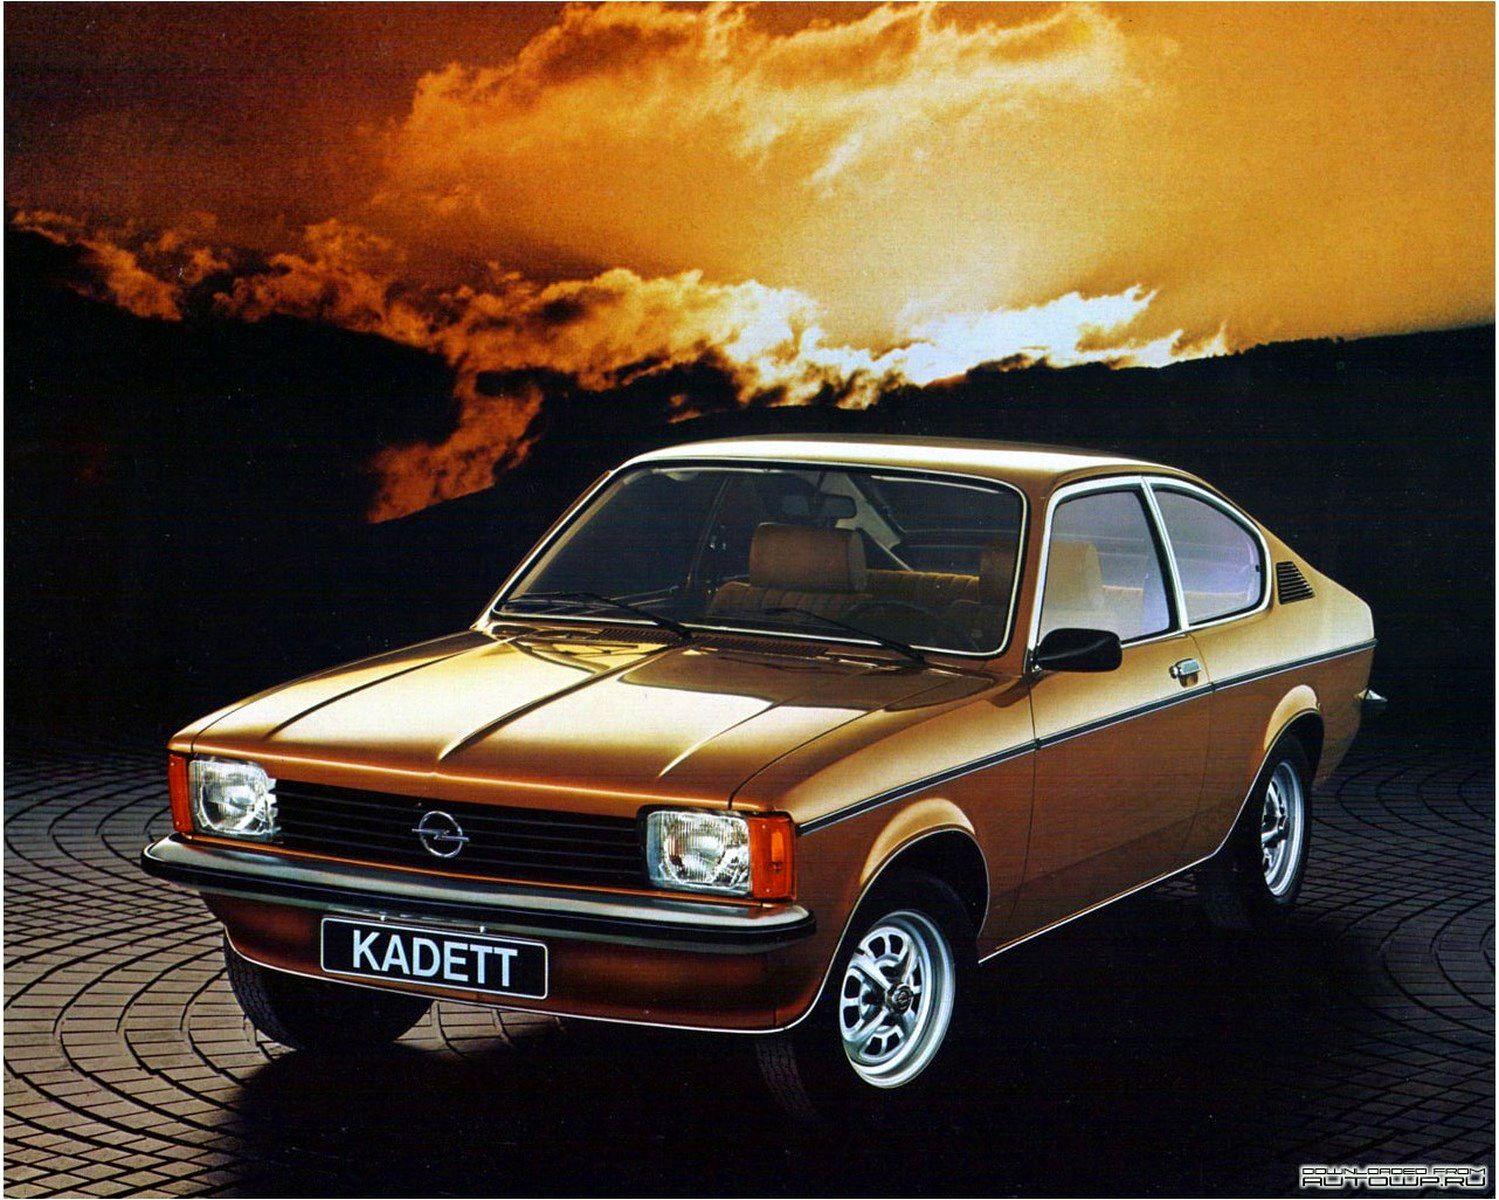 Opel Kadett C Coupe Classic Cars Pinterest Cars Cars